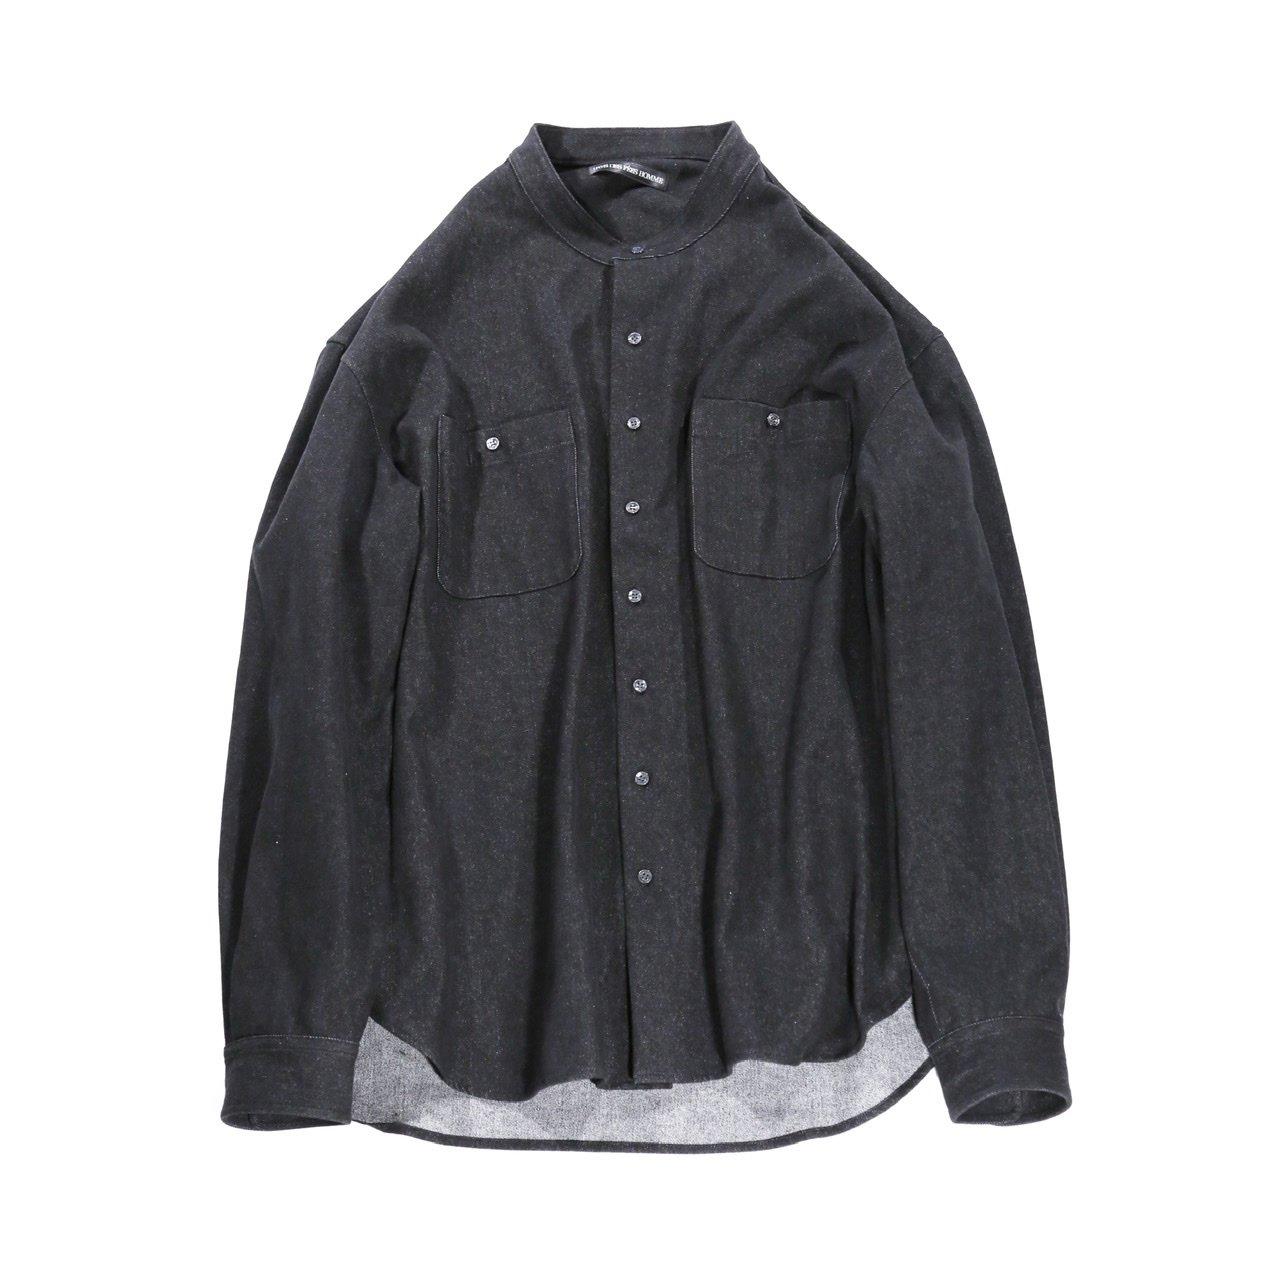 Oversized no collar black denim shirt jacket